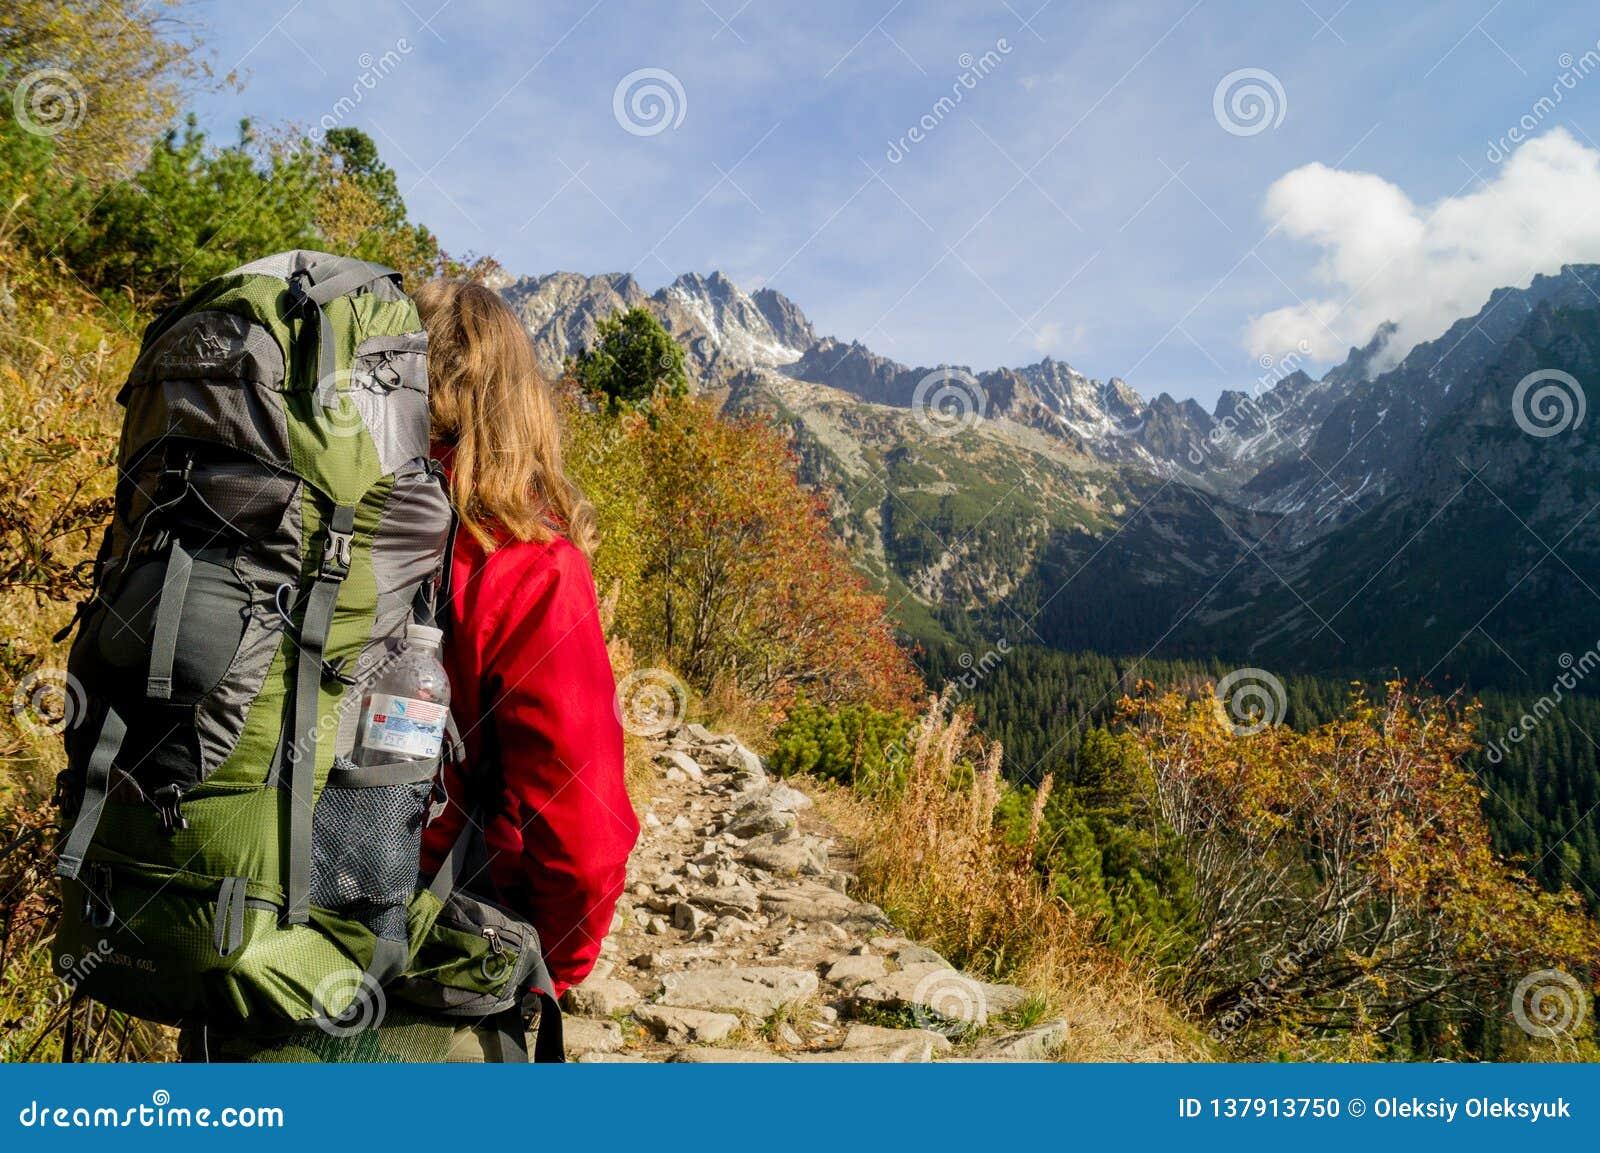 Beau voyageur Parc narodny de Tatransky Vysoke tatry slovakia